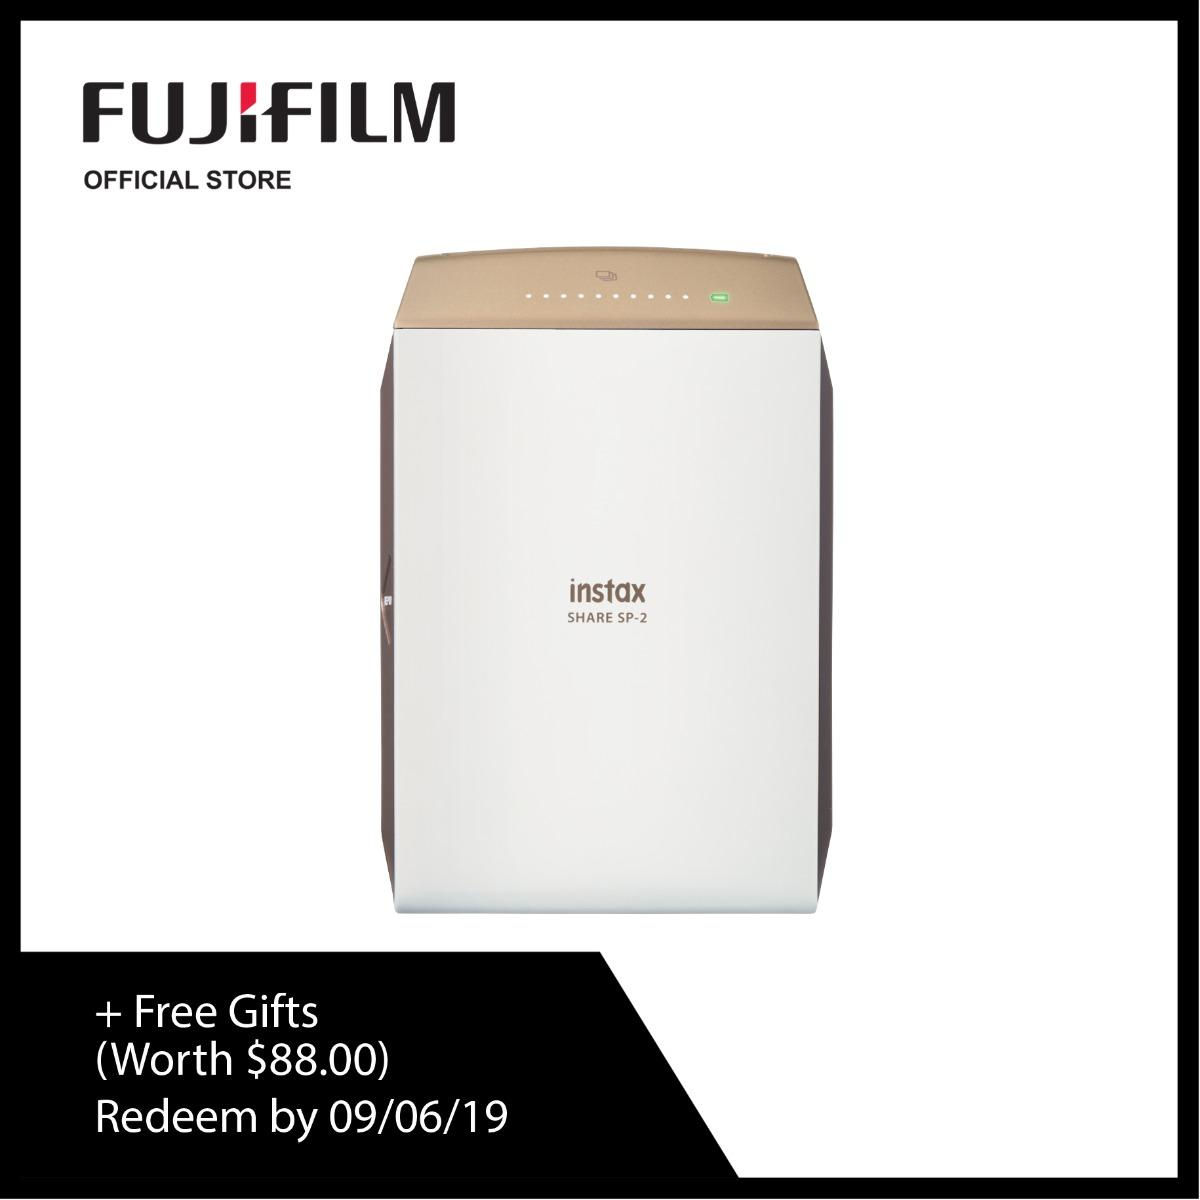 [may Promo] Fujifilm Instax Mini Sp2 Bundle Pack (free Gifts Worth $88) By Fujifilm.